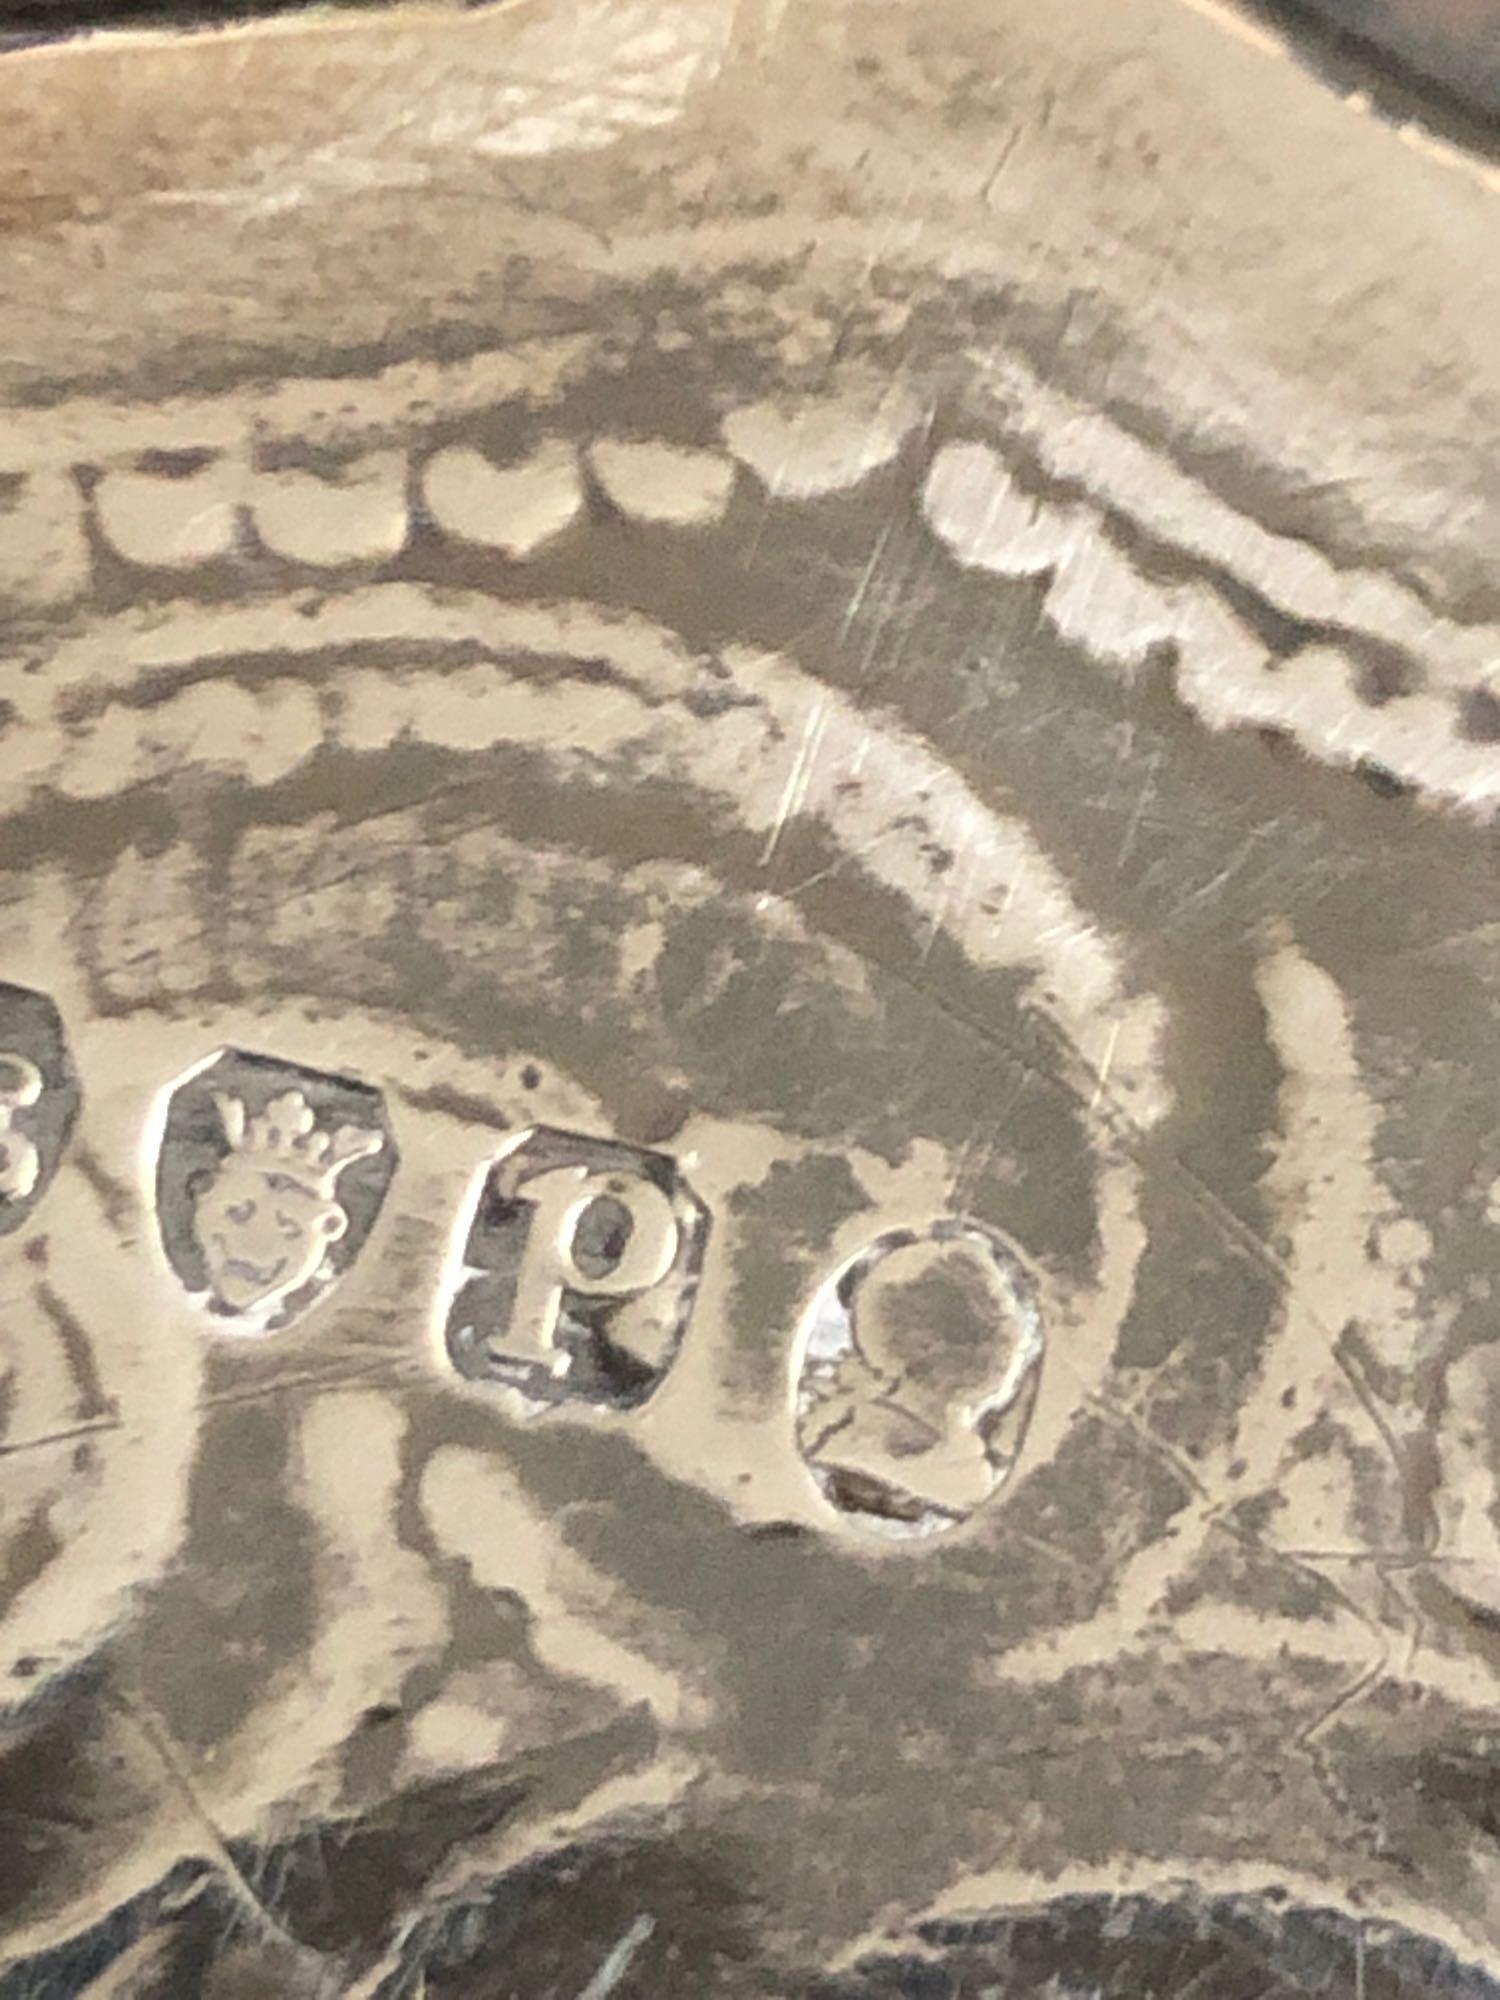 3 LEGGED SILVER TRAY - Image 7 of 7